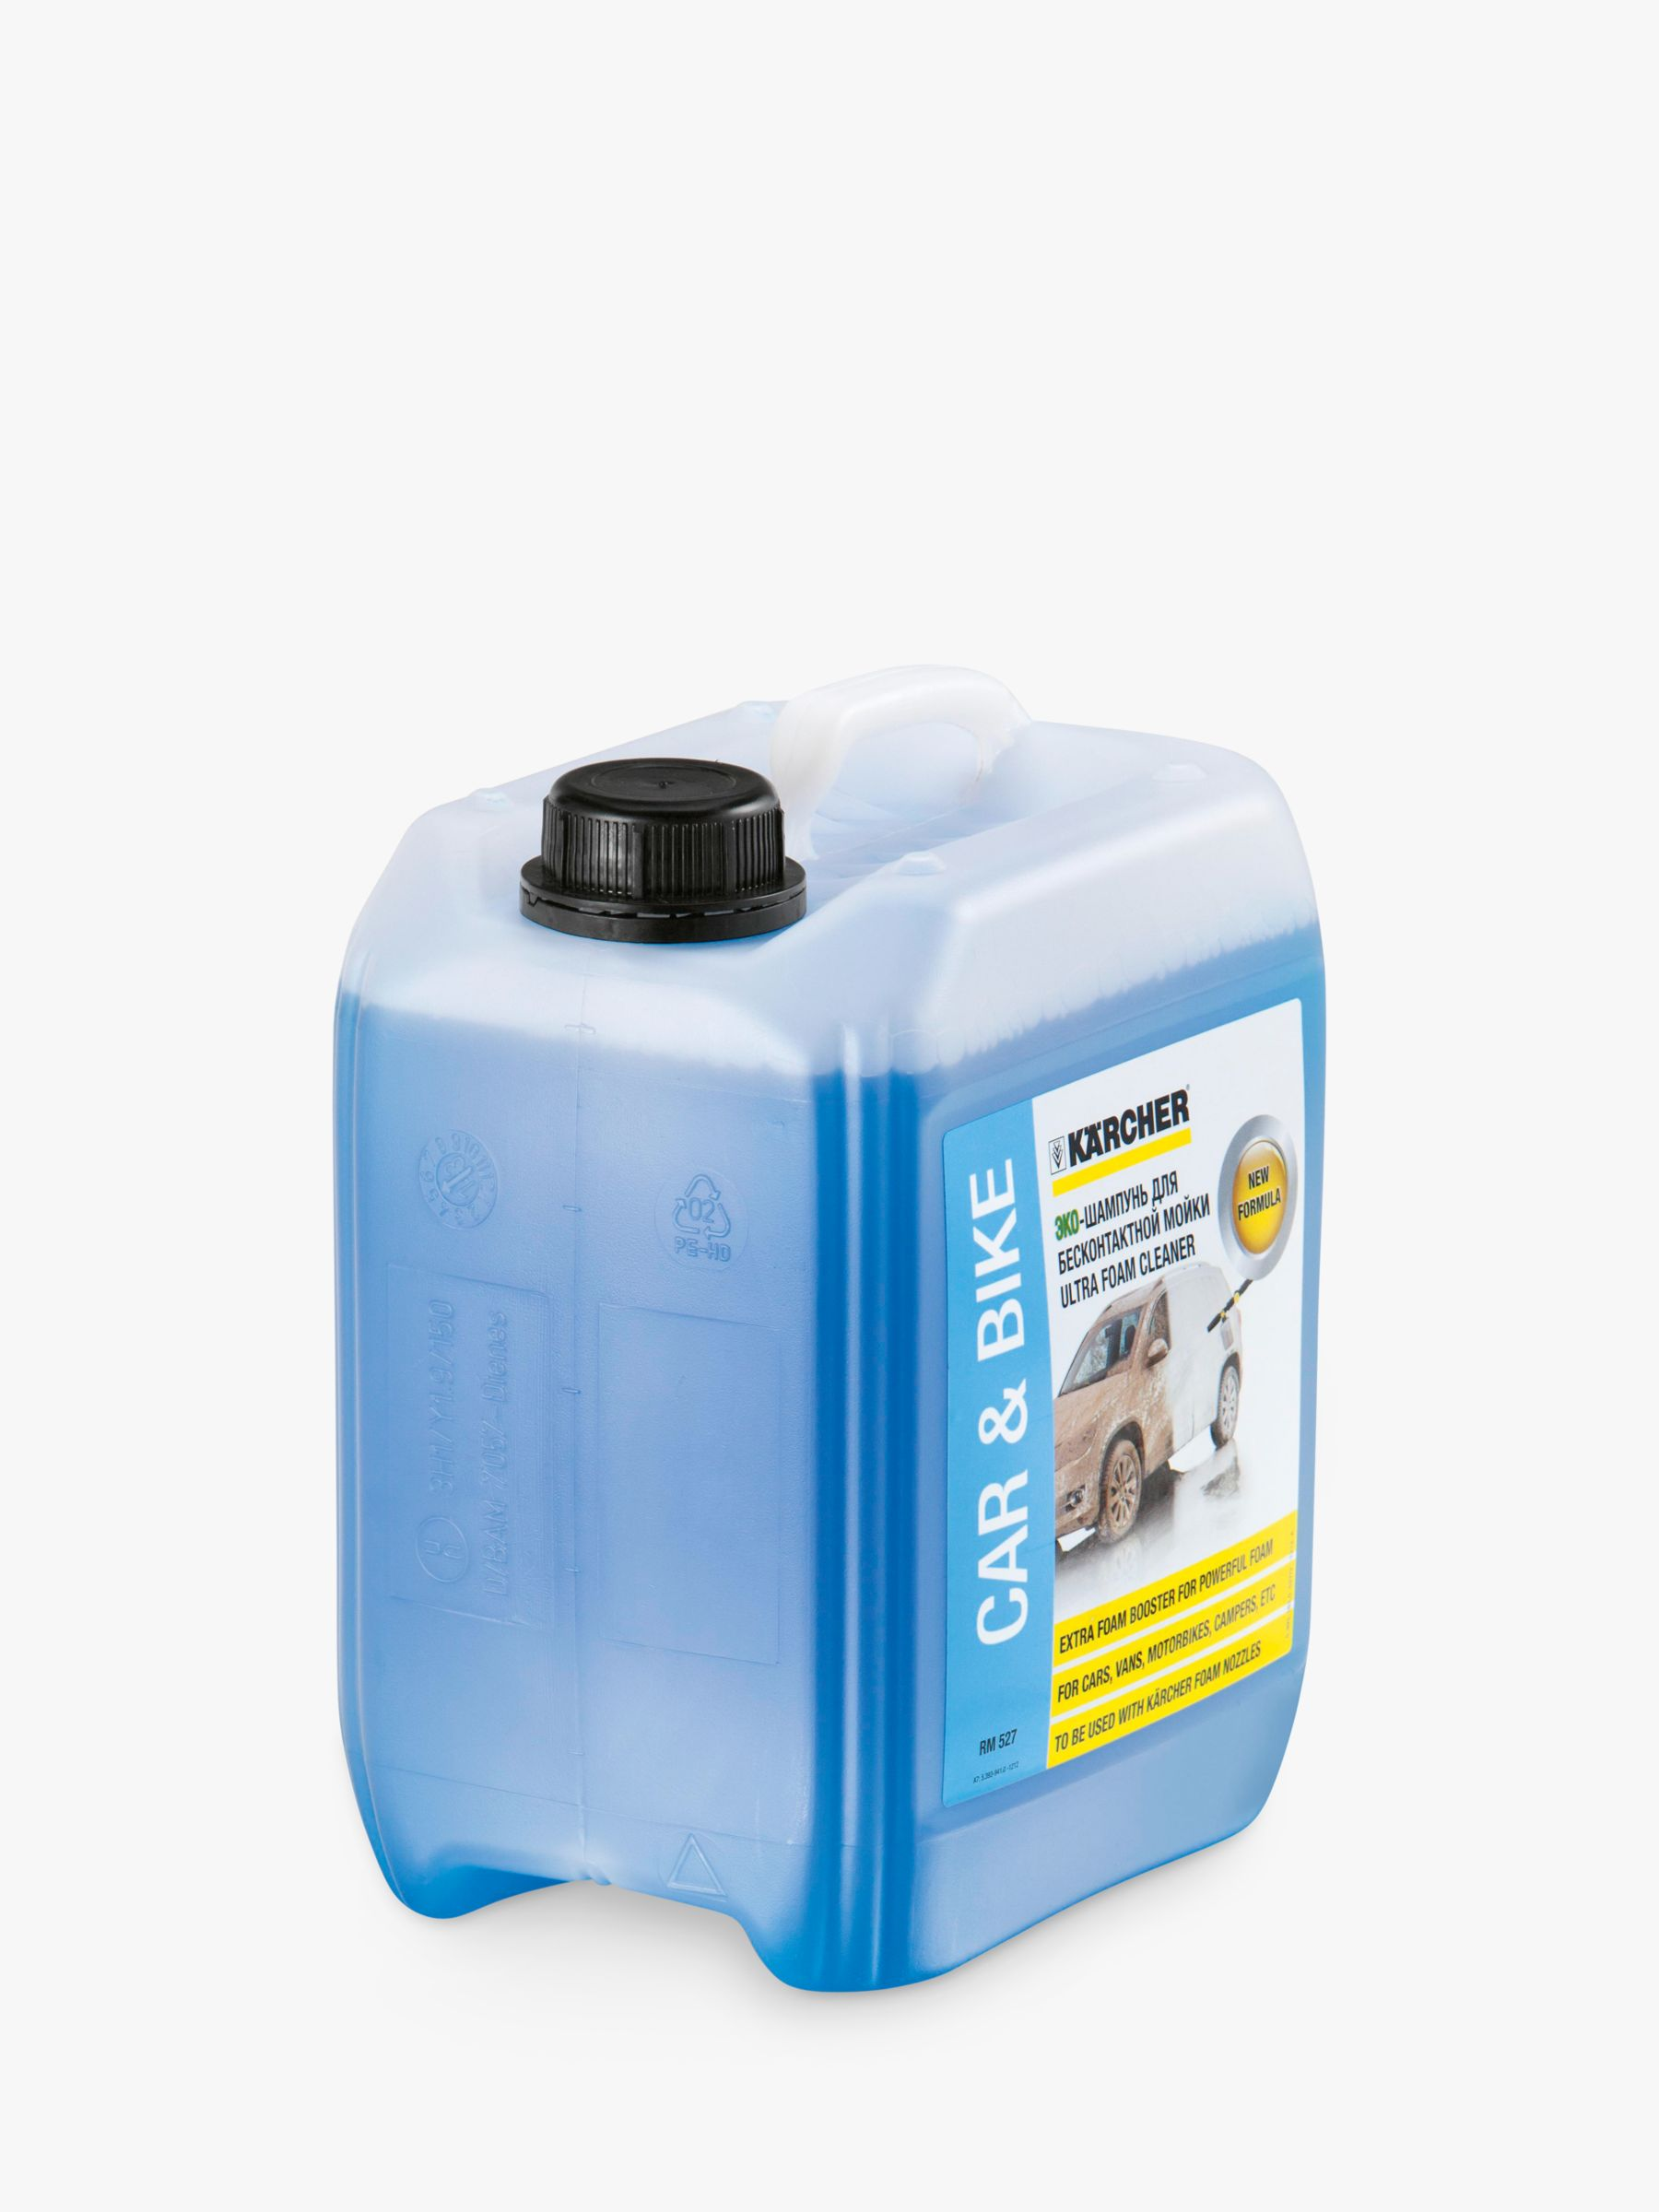 Karcher Kärcher Ultra Foam Cleaner, 1L